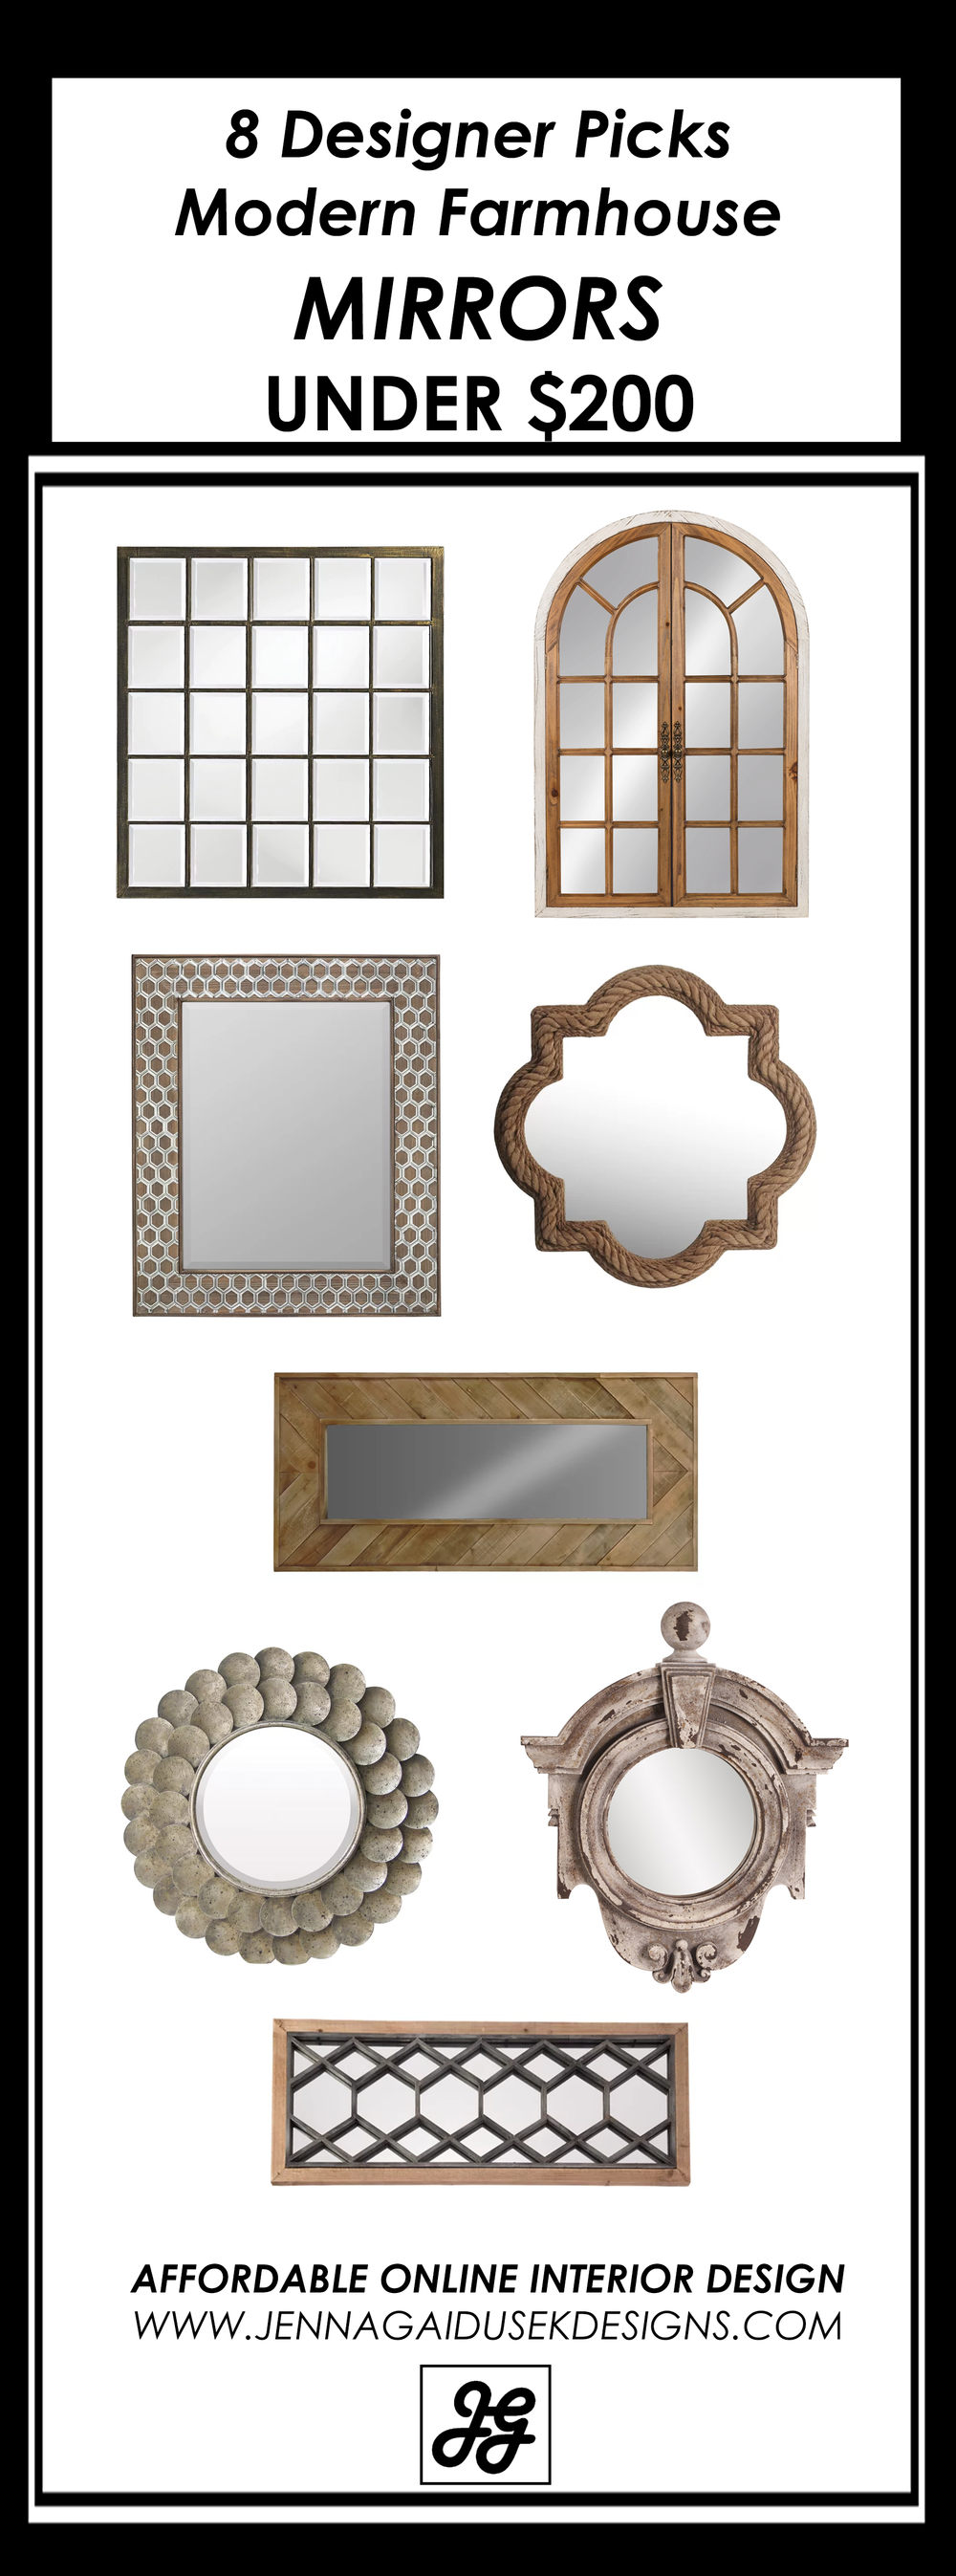 Farmhouse mirrors under $200